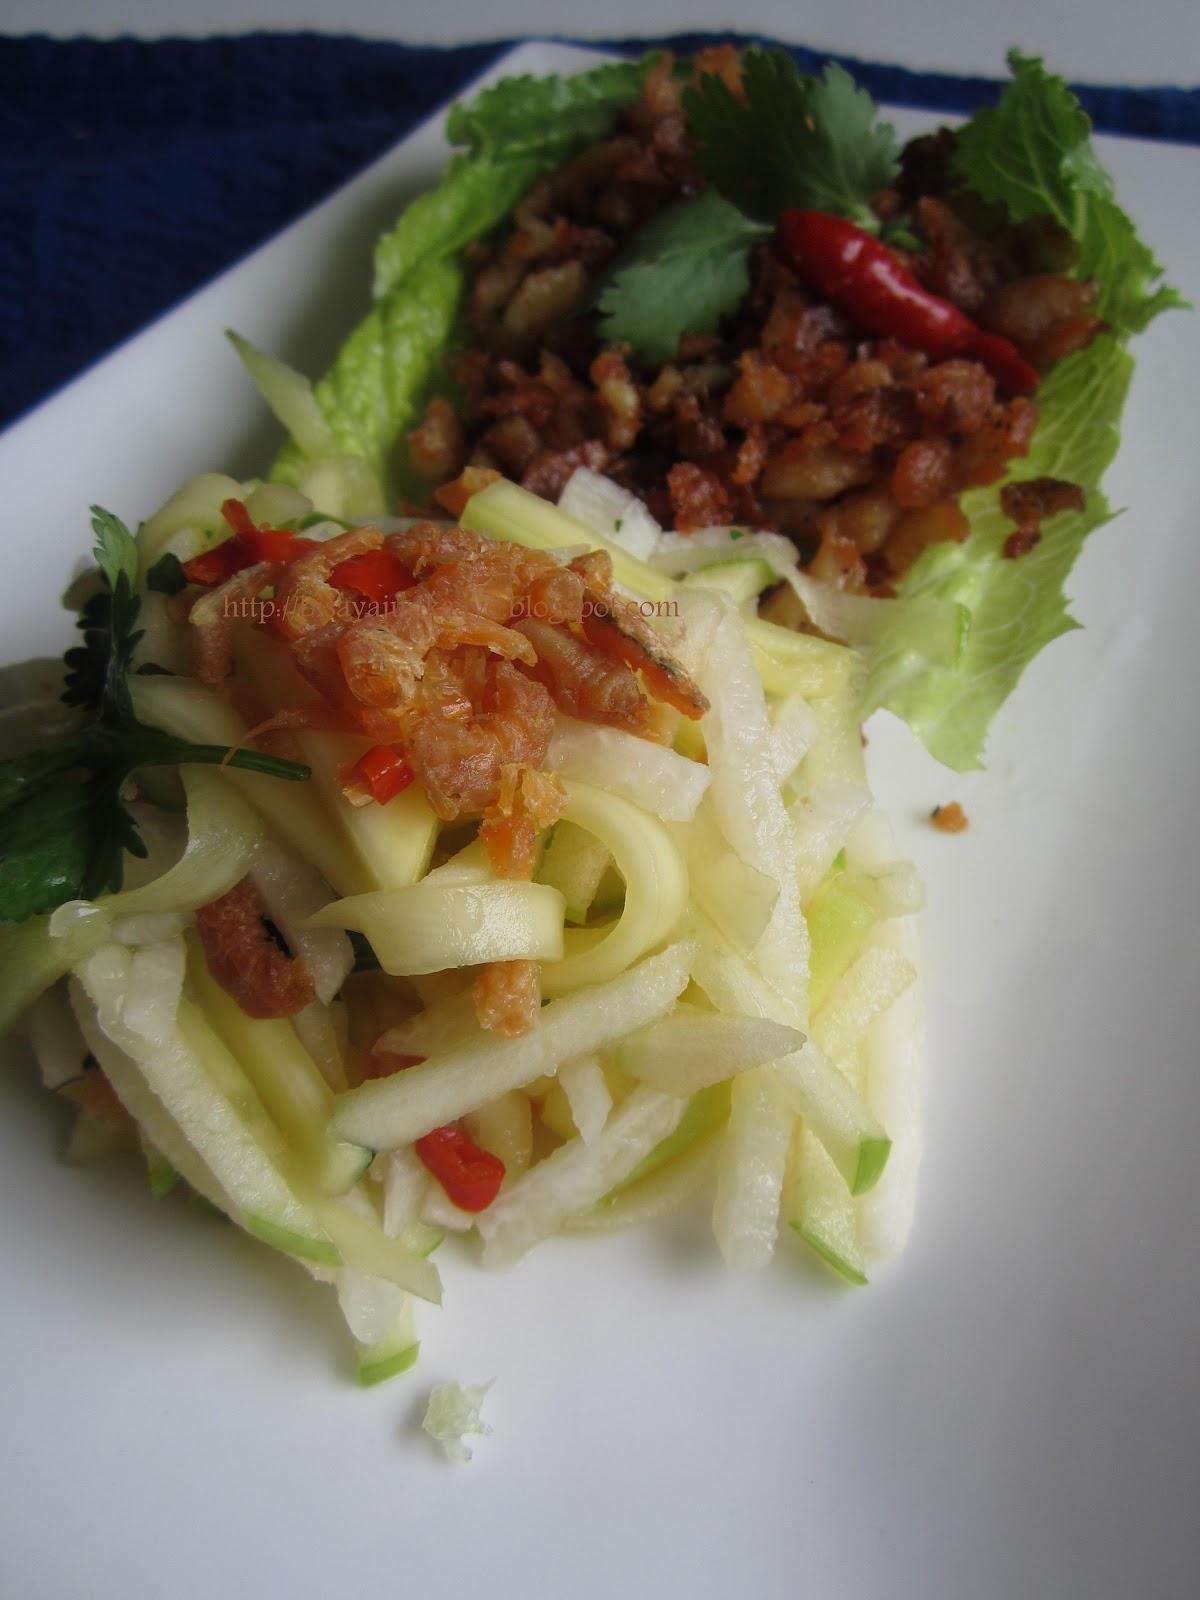 ... and green mango thai food crispy fish with recipe green mango salad